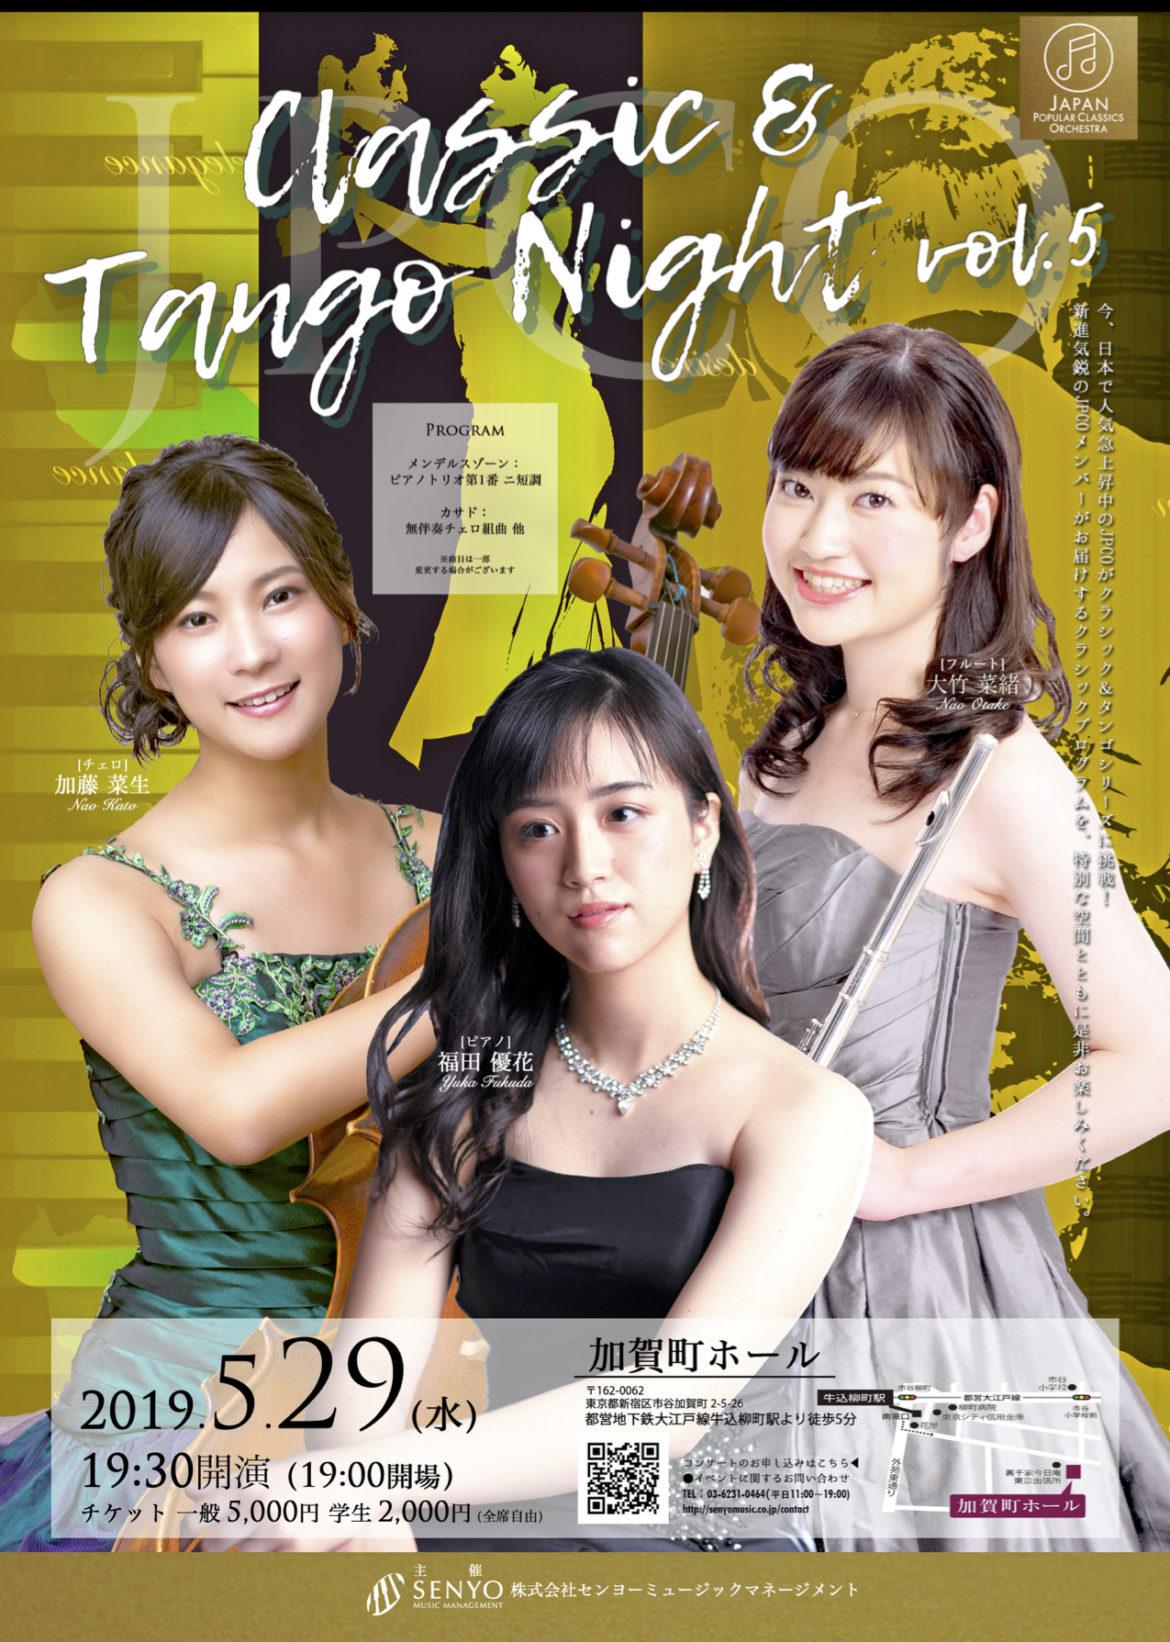 2019.5.29  JPCO CLASSIC & TANGO NIGHT  vol.5